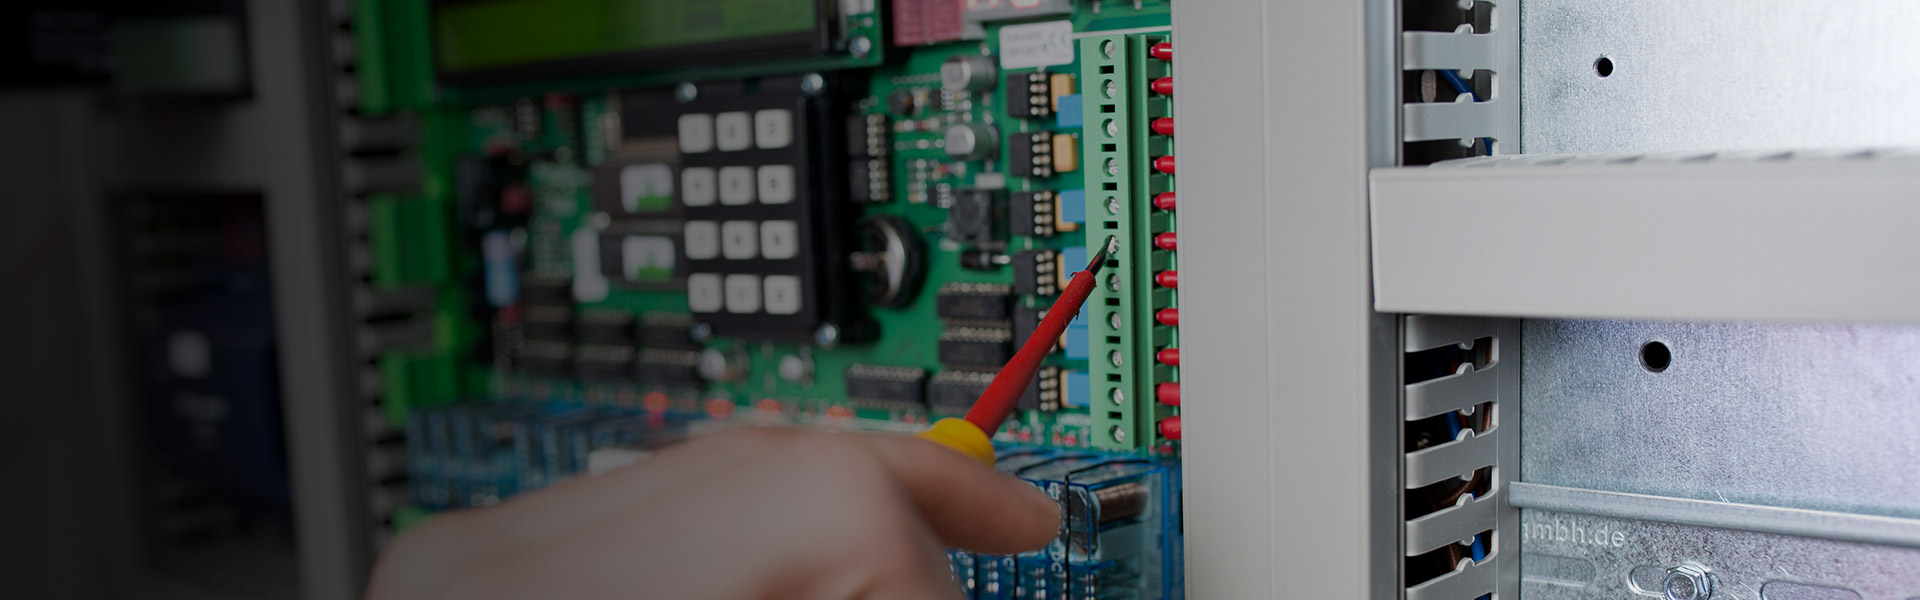 Elektriker Fachbetrieb